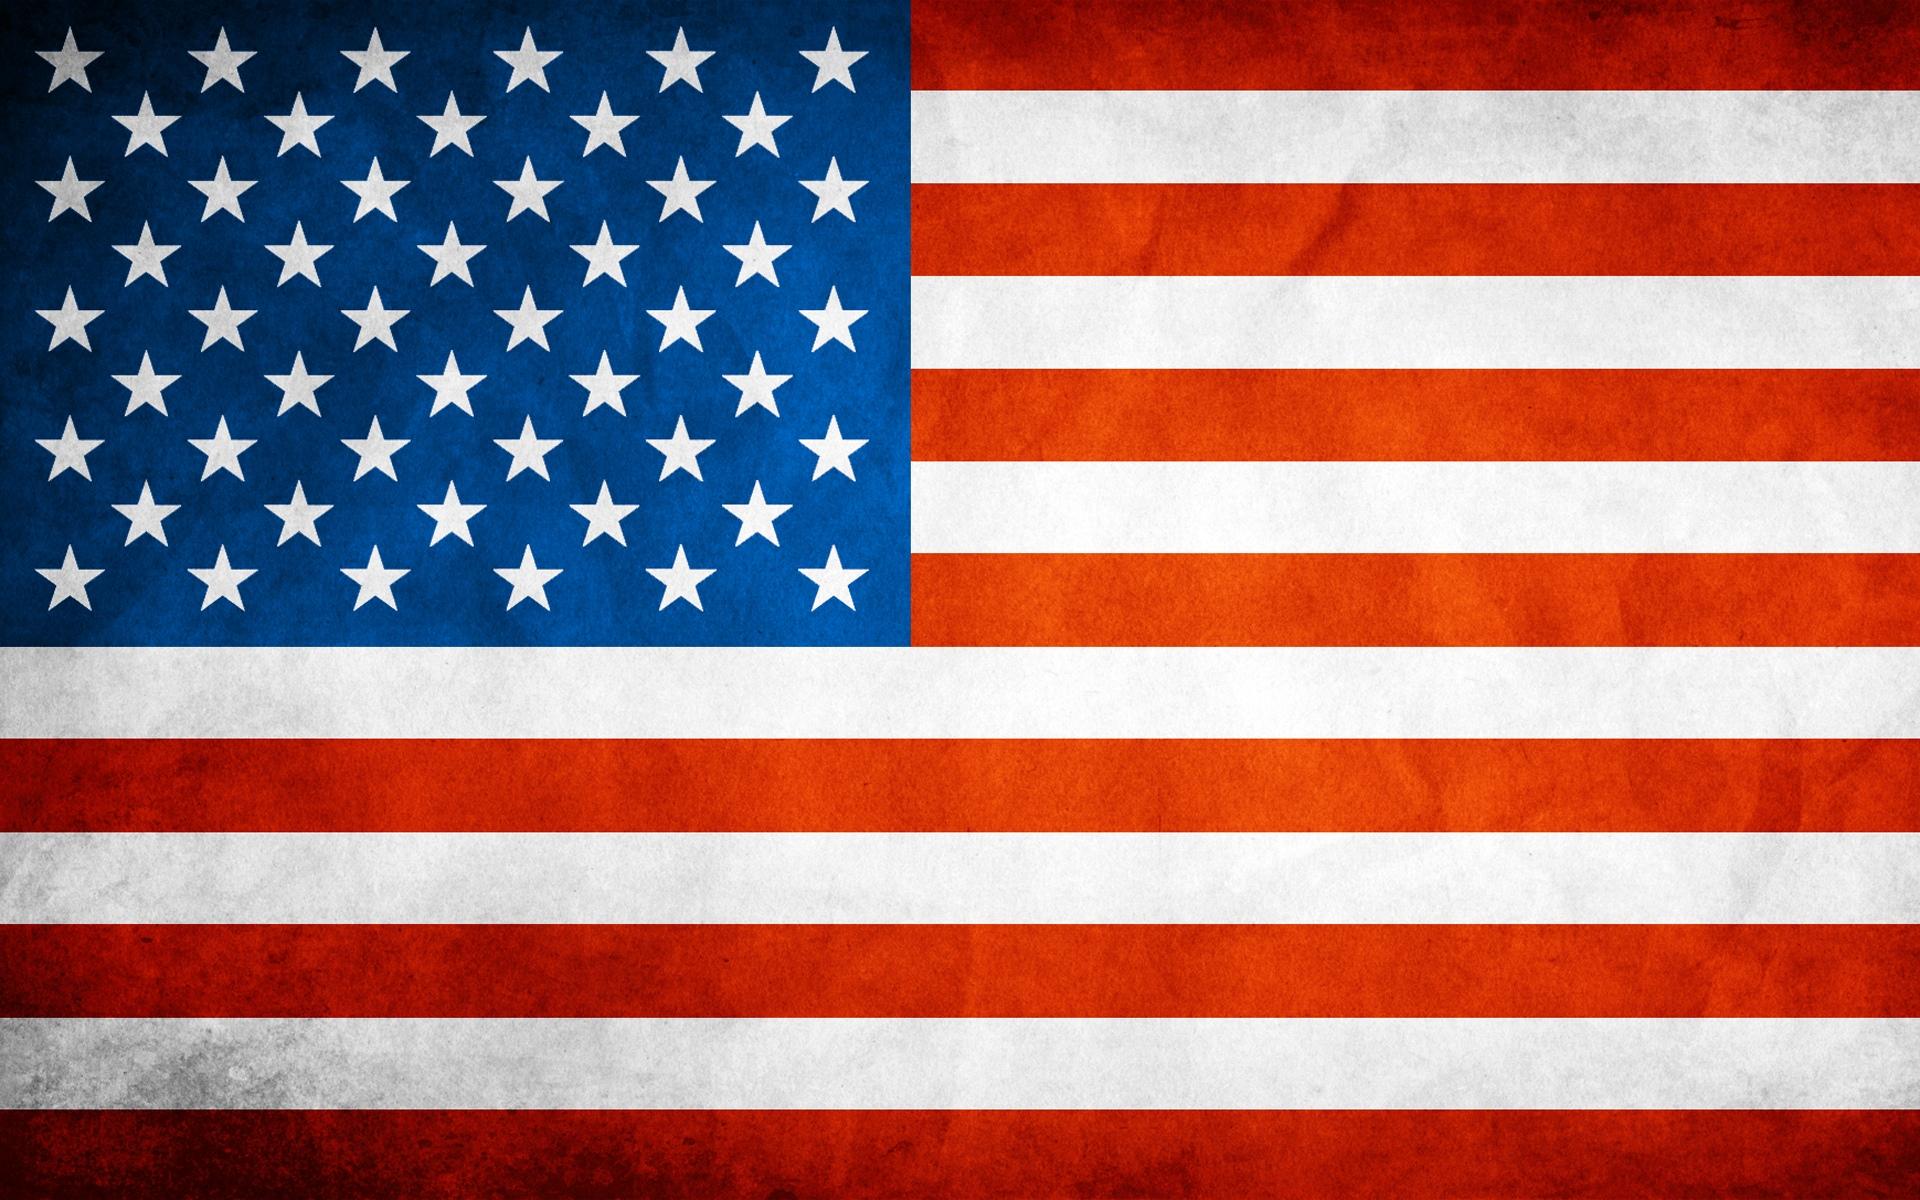 Image: http://www.desktopwallpaperhd.net/wallpapers/10/d/flags-wallpaper-usa-109725.jpg